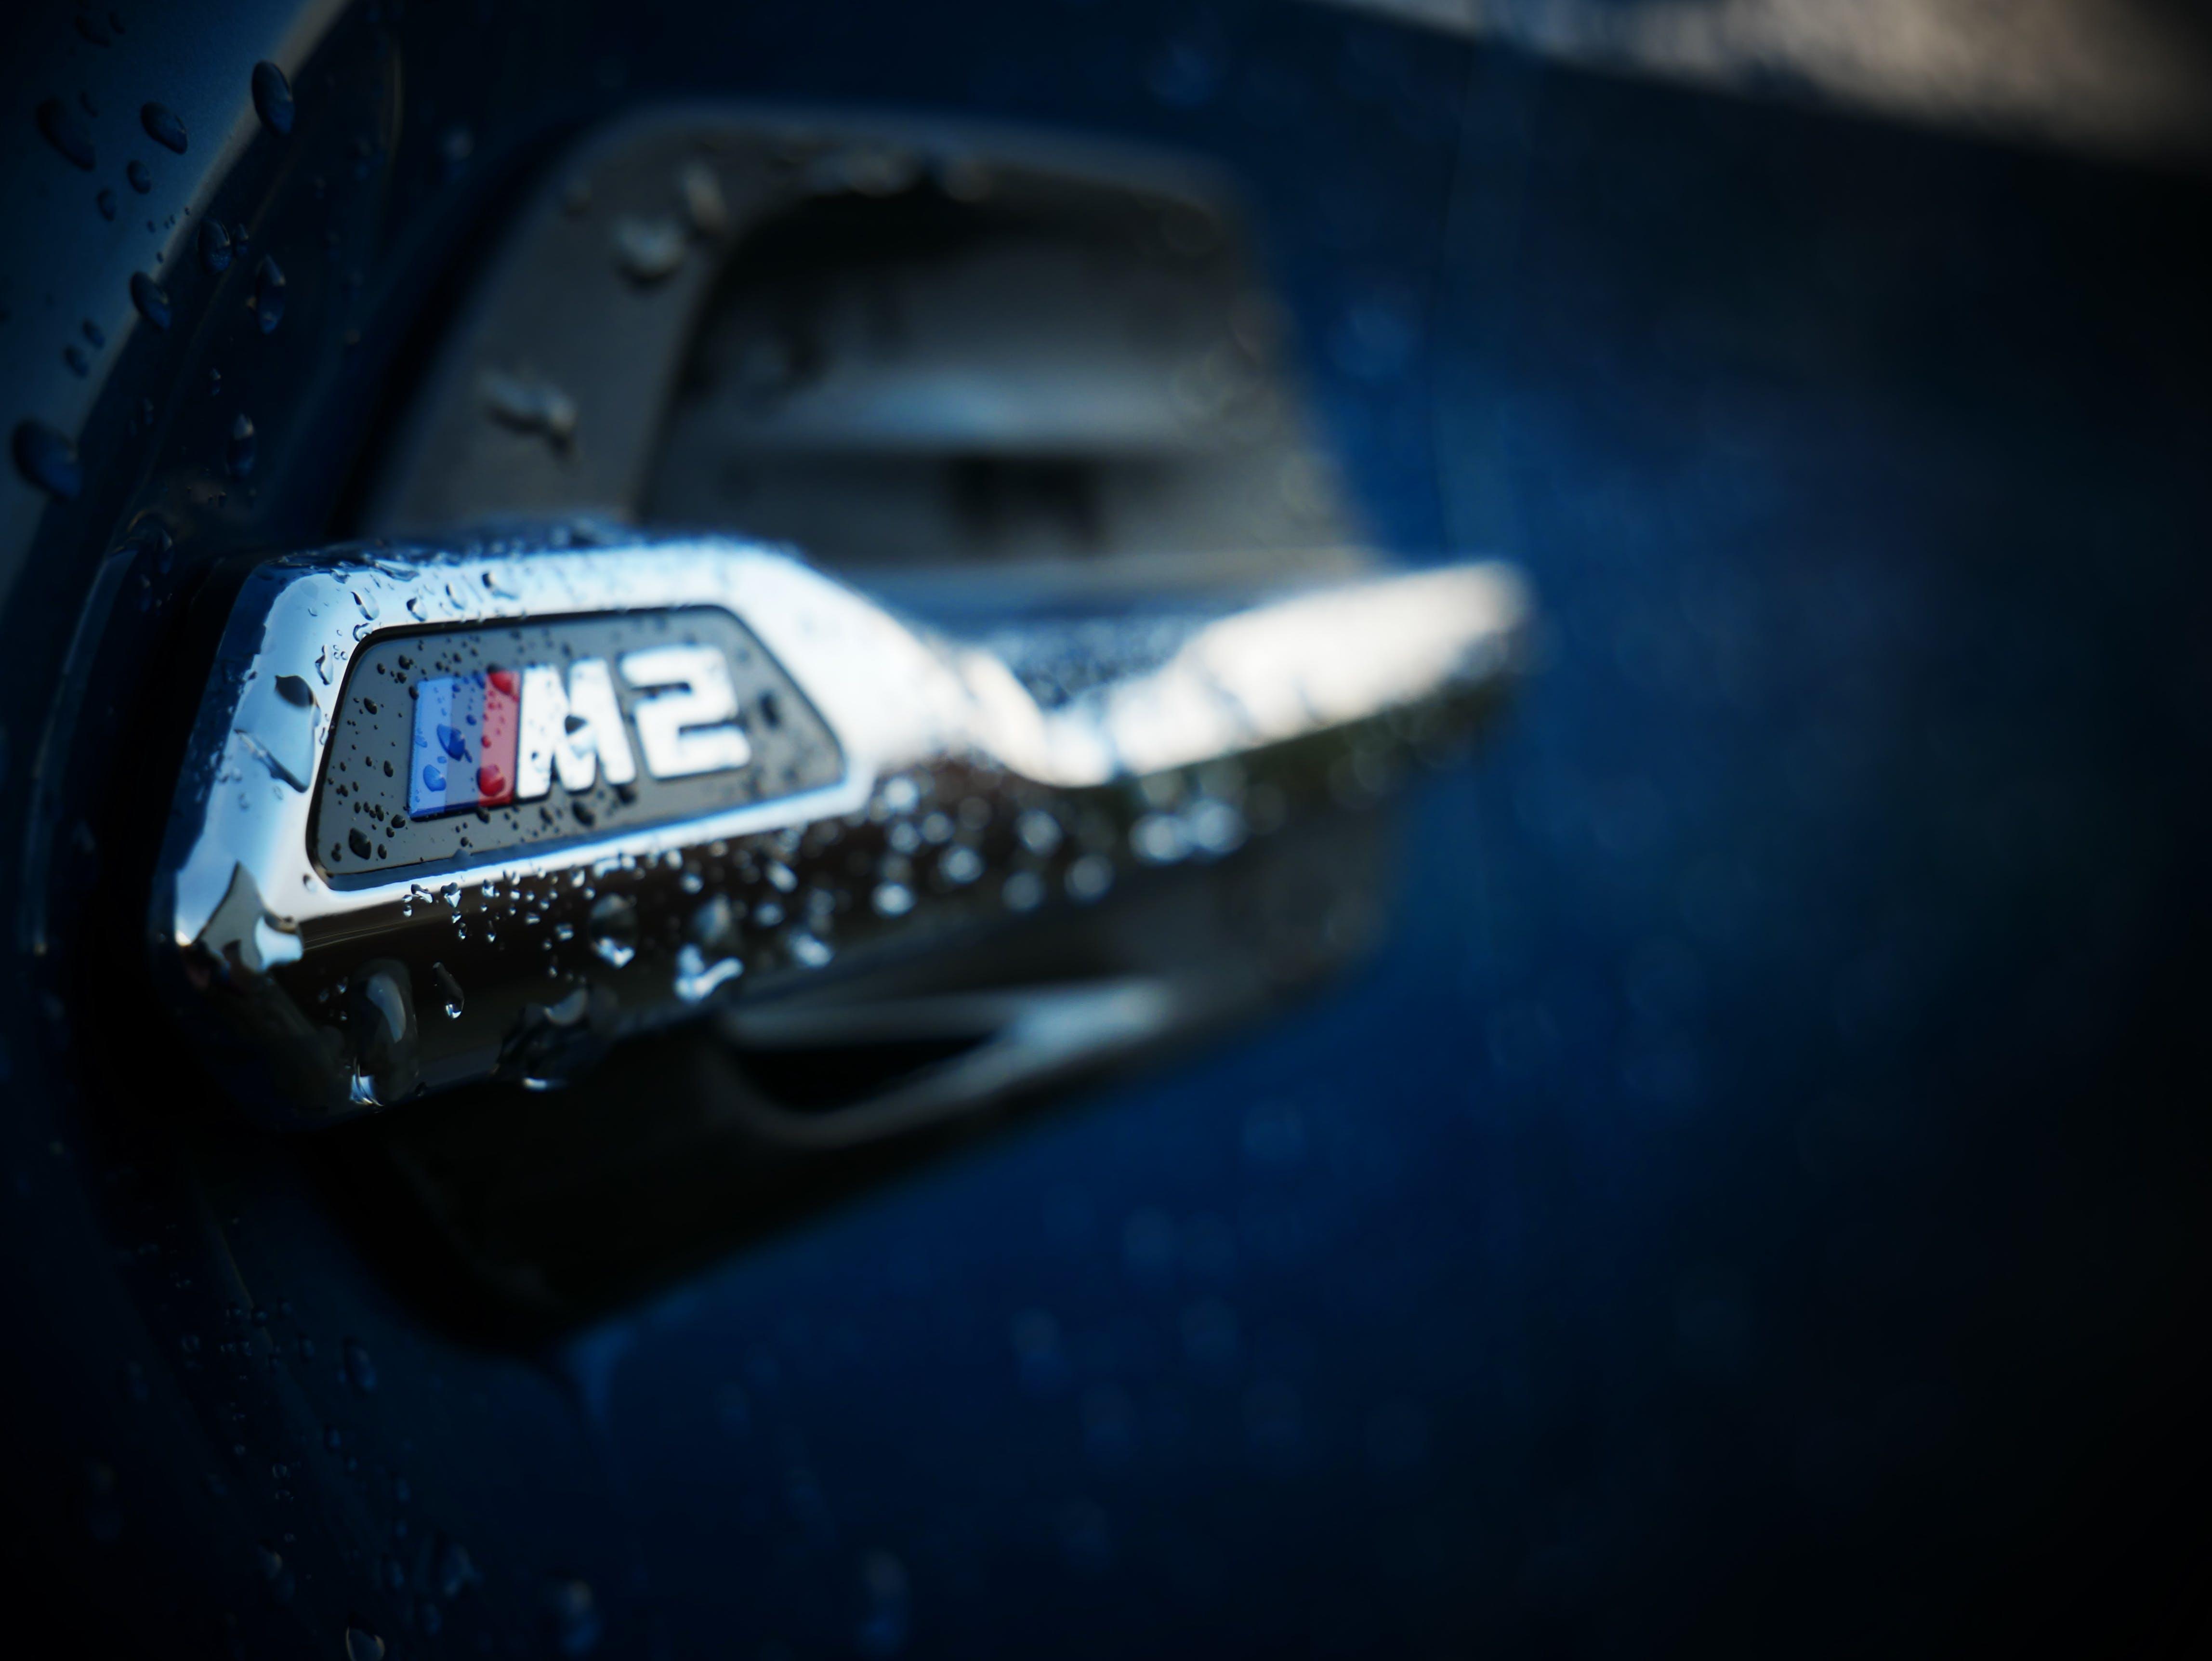 Gratis lagerfoto af 4k, 4k-baggrund, bil, bilbaggrund